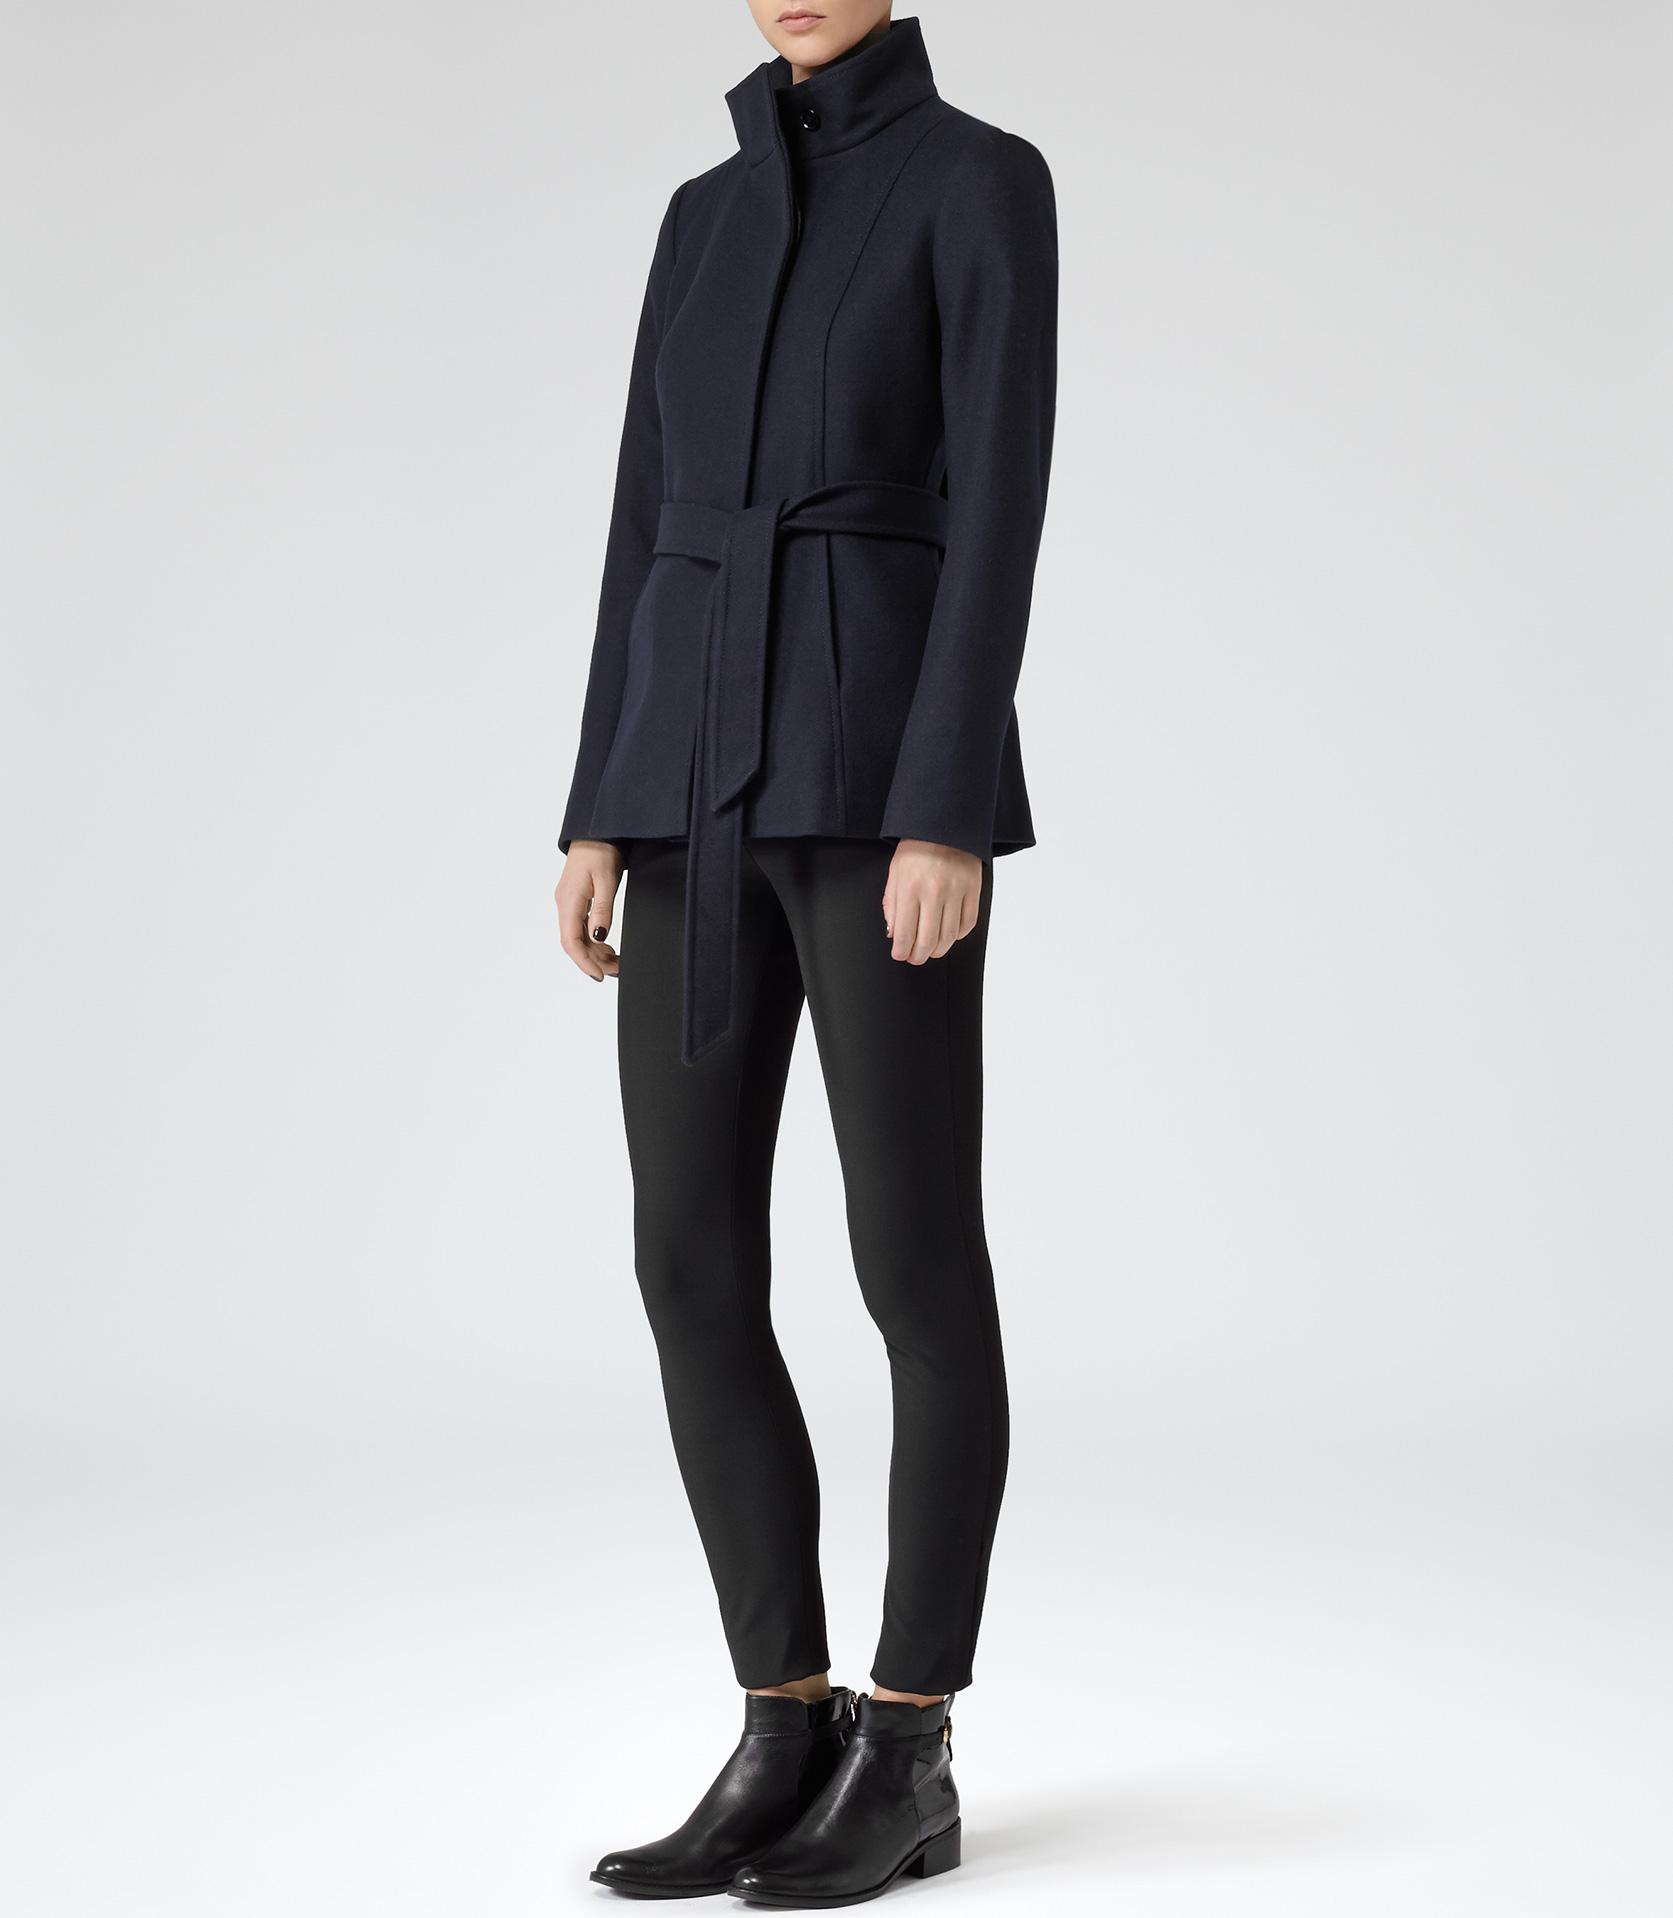 Hermitage Lux Navy Belted Wool Jacket - REISS